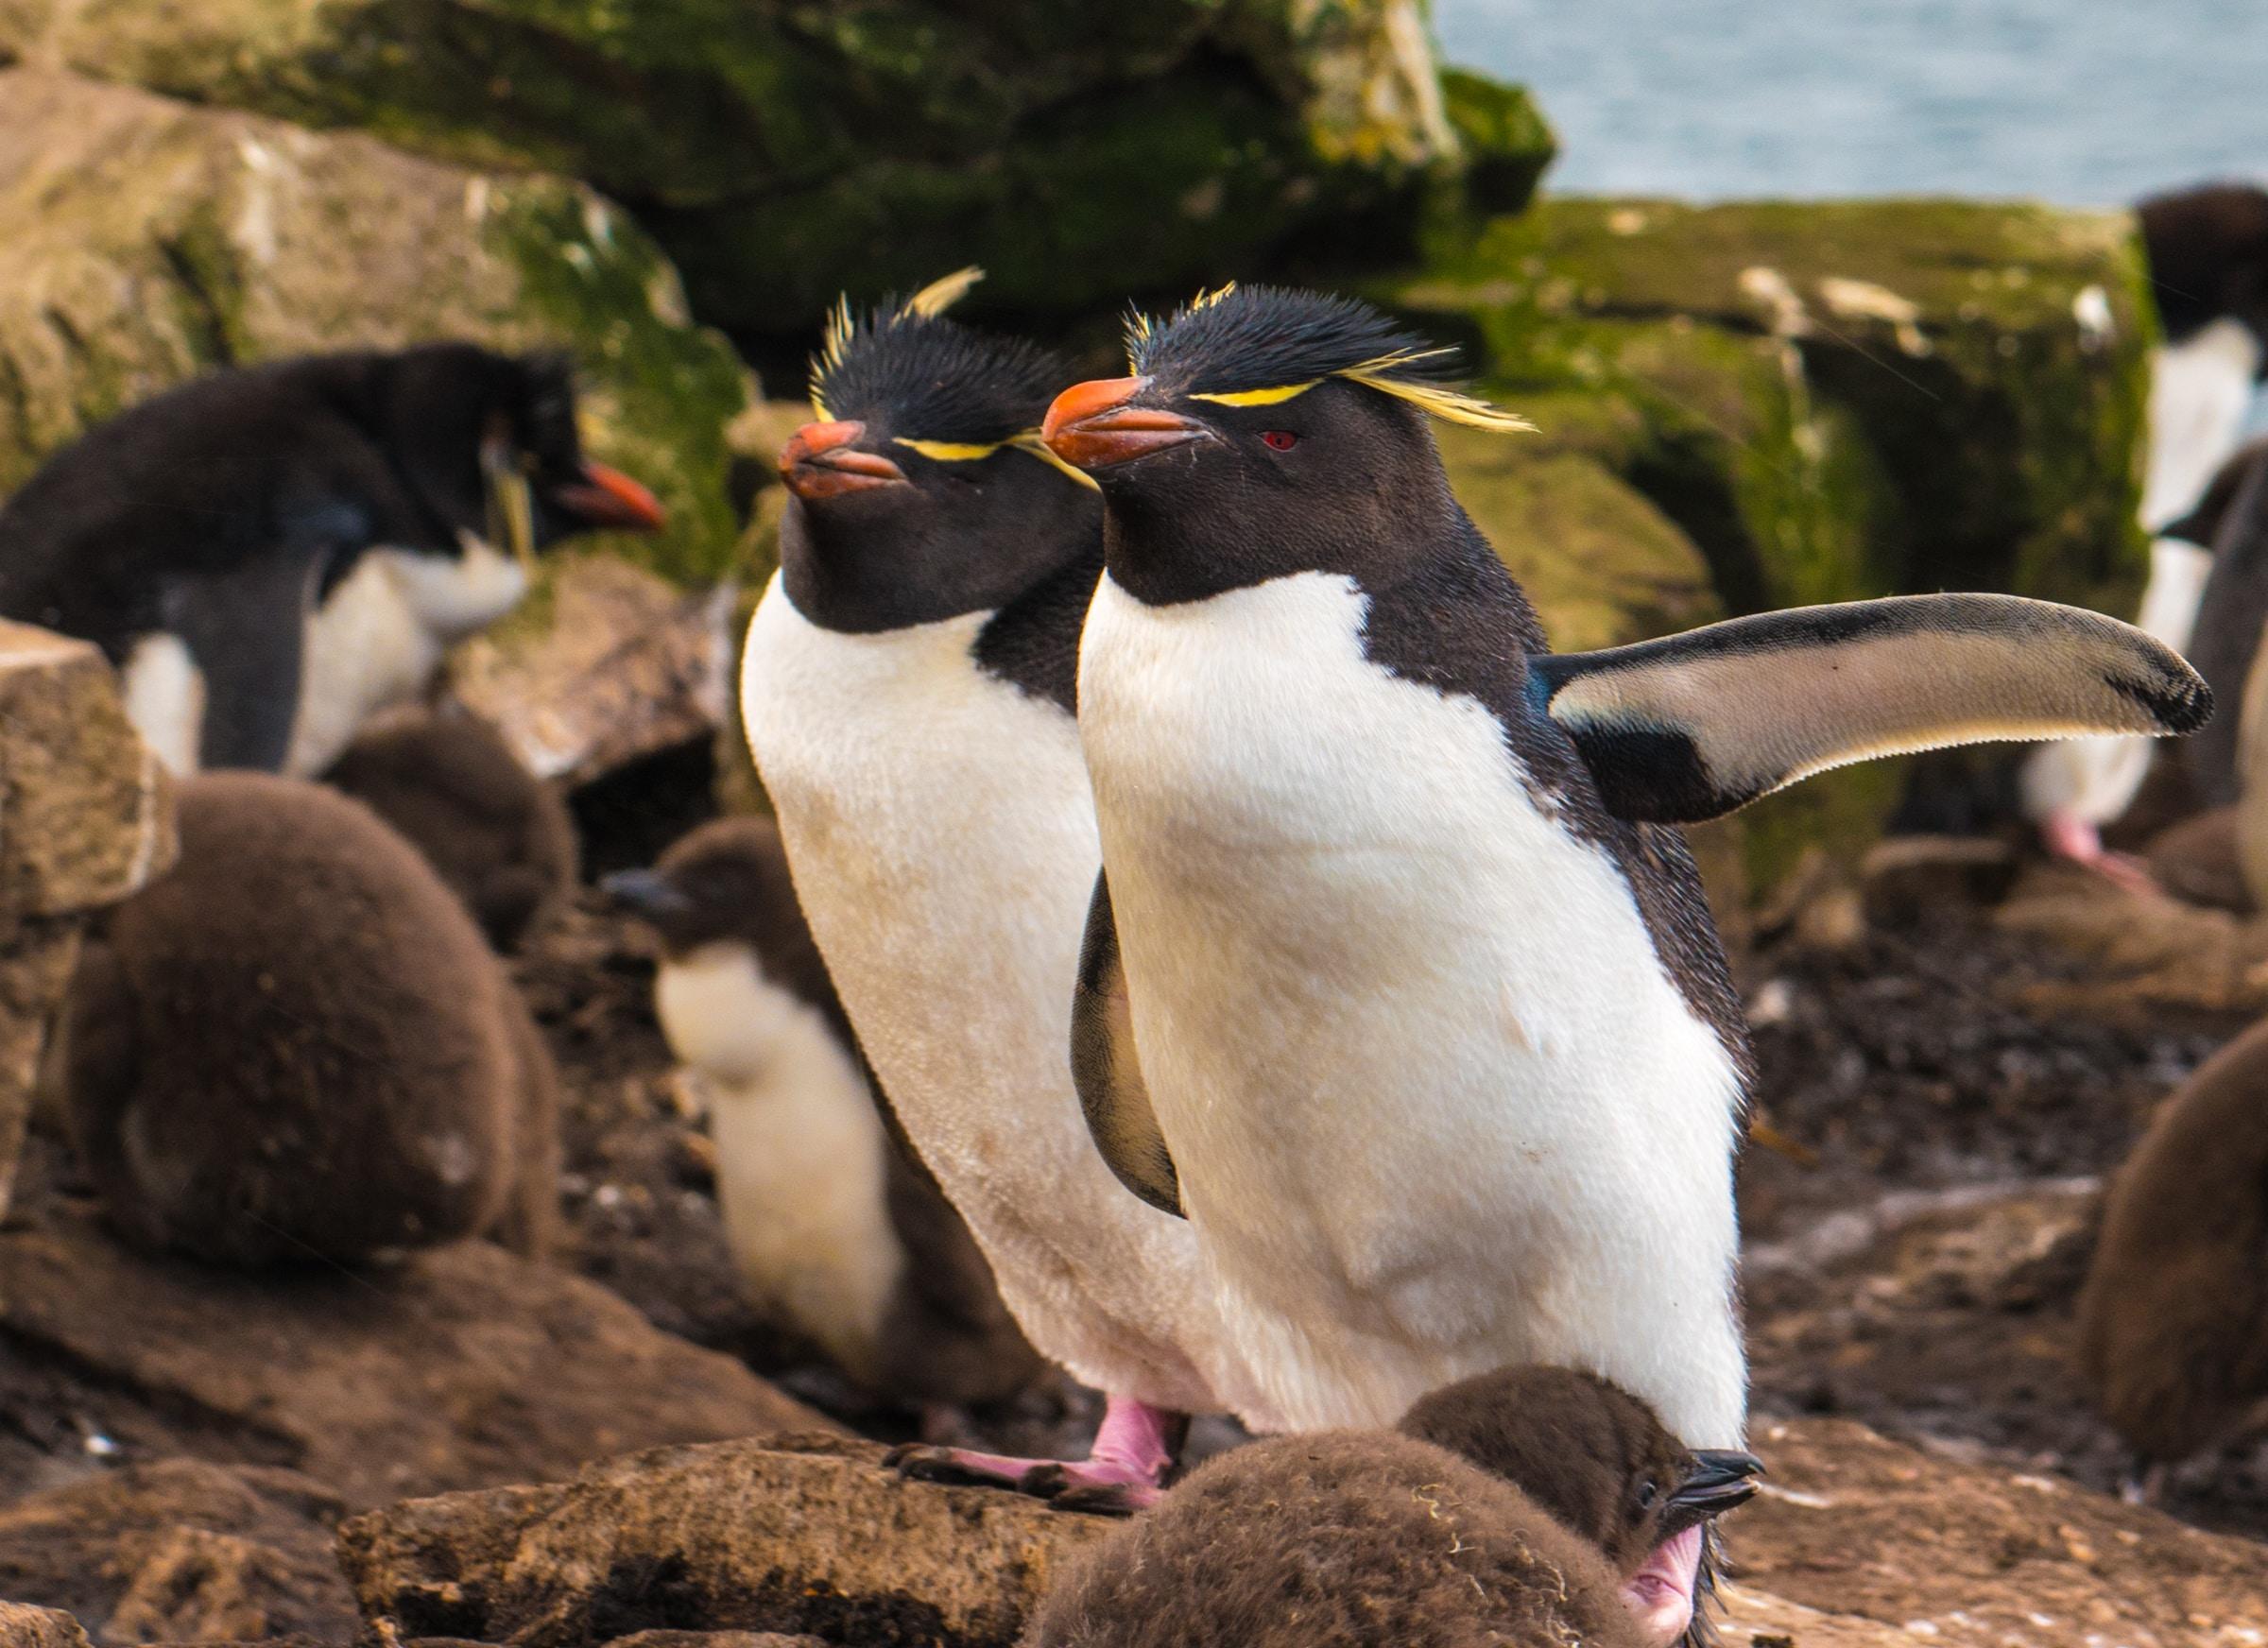 two white penguins walking near each other near sea